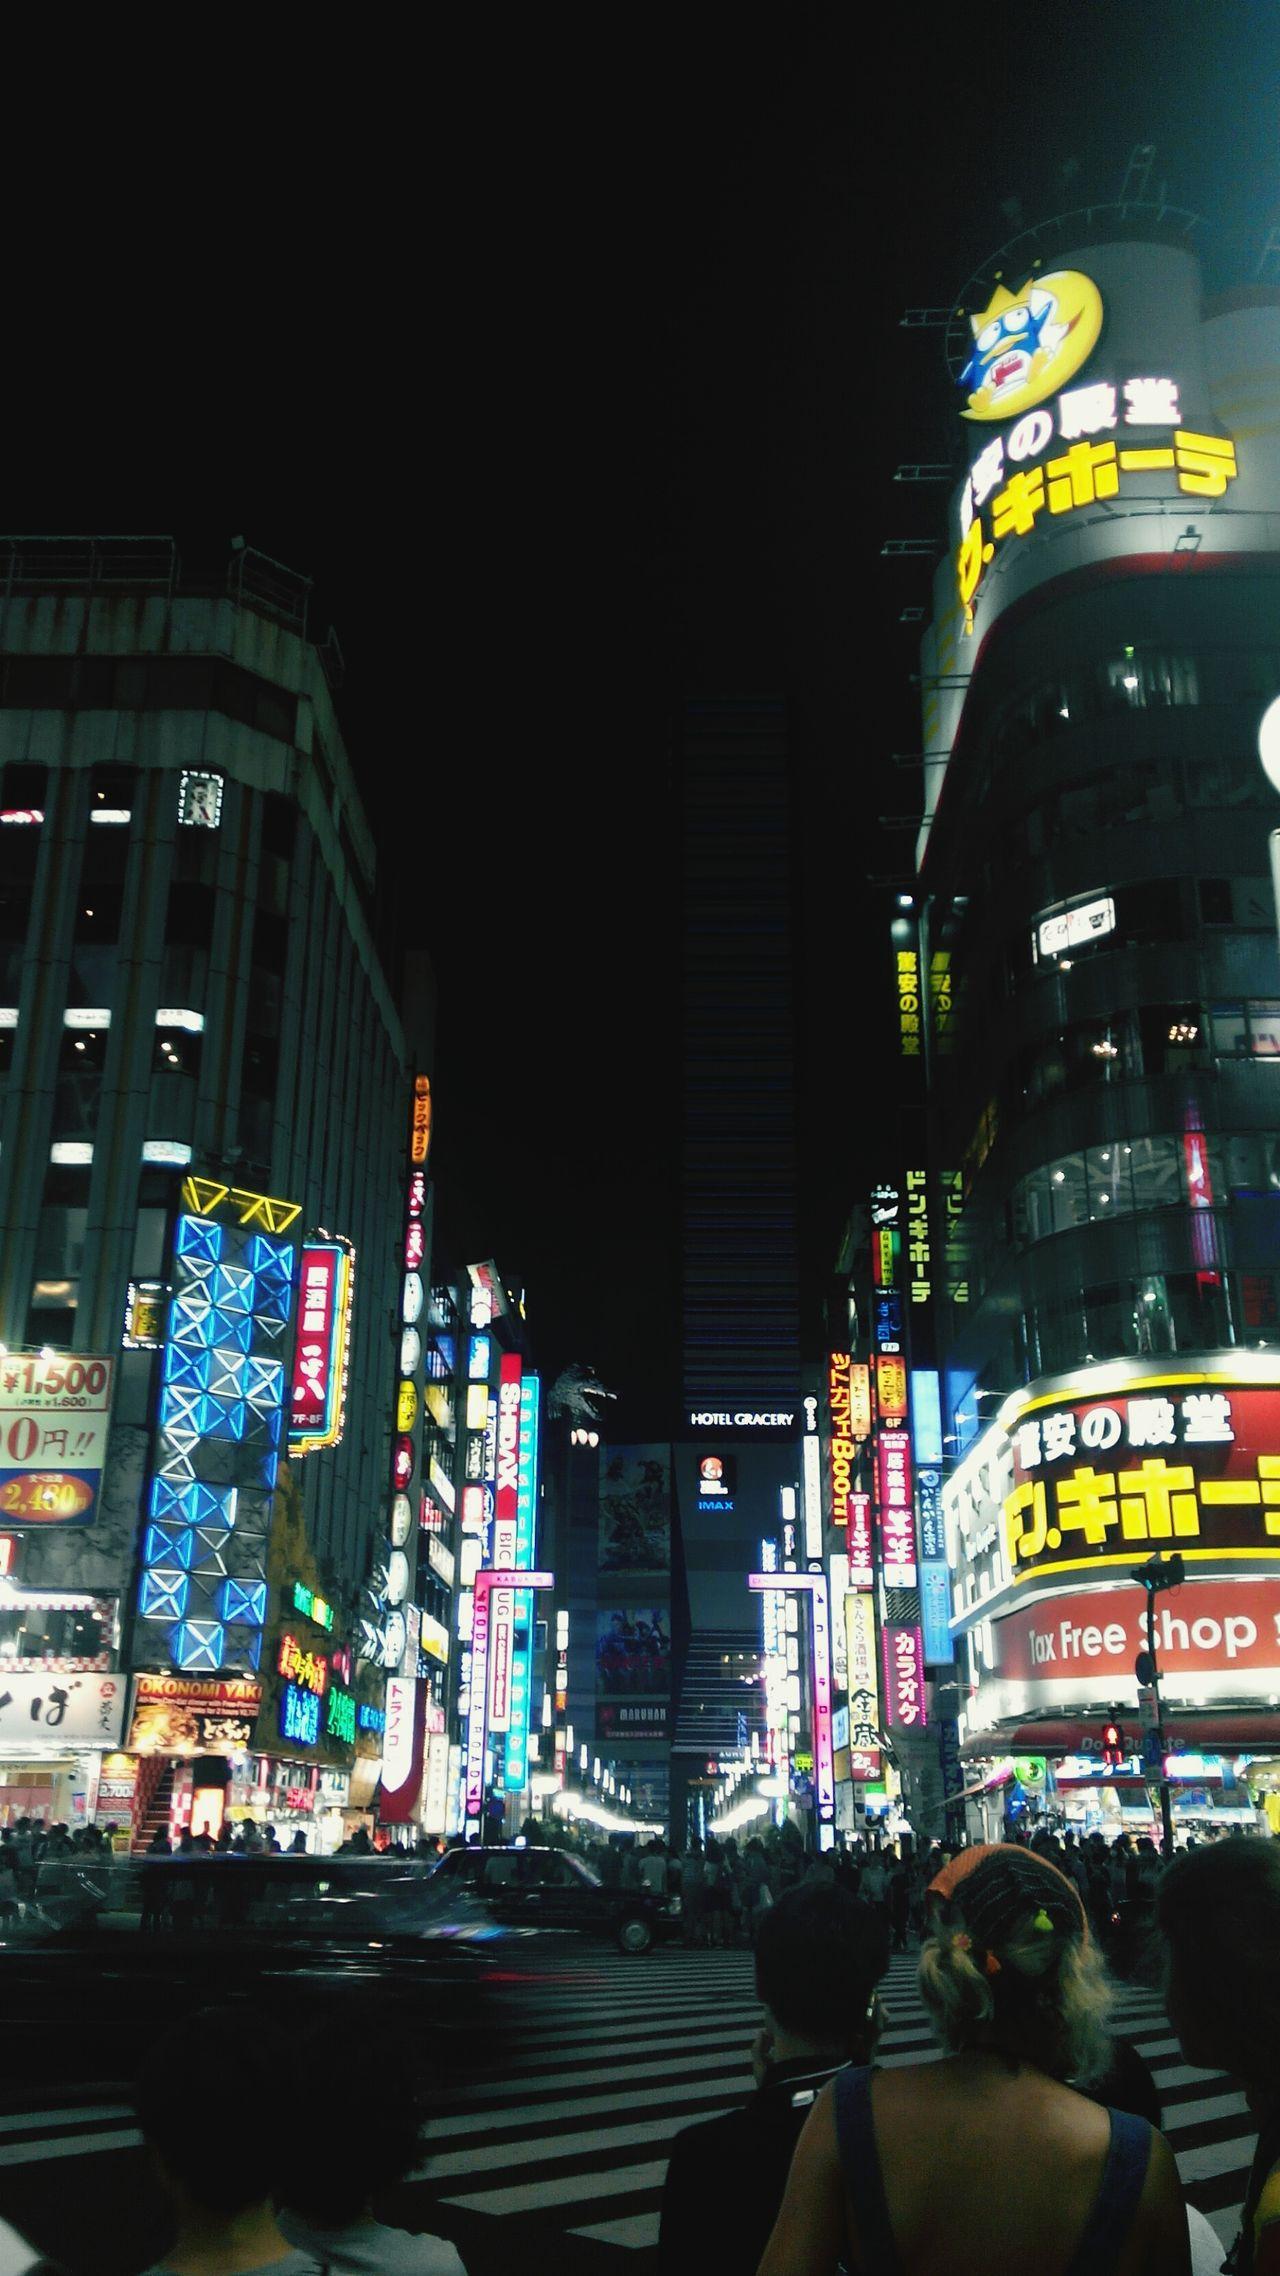 Night Travel Destinations Large Group Of People City Life Nightlife People Outdoors Sky Shinjuku Tokyo Tokyo,Japan Japan Street Street Life Night Lights Night Life Crossing Stores Cars Moving Move Wait Waiting Building Framing